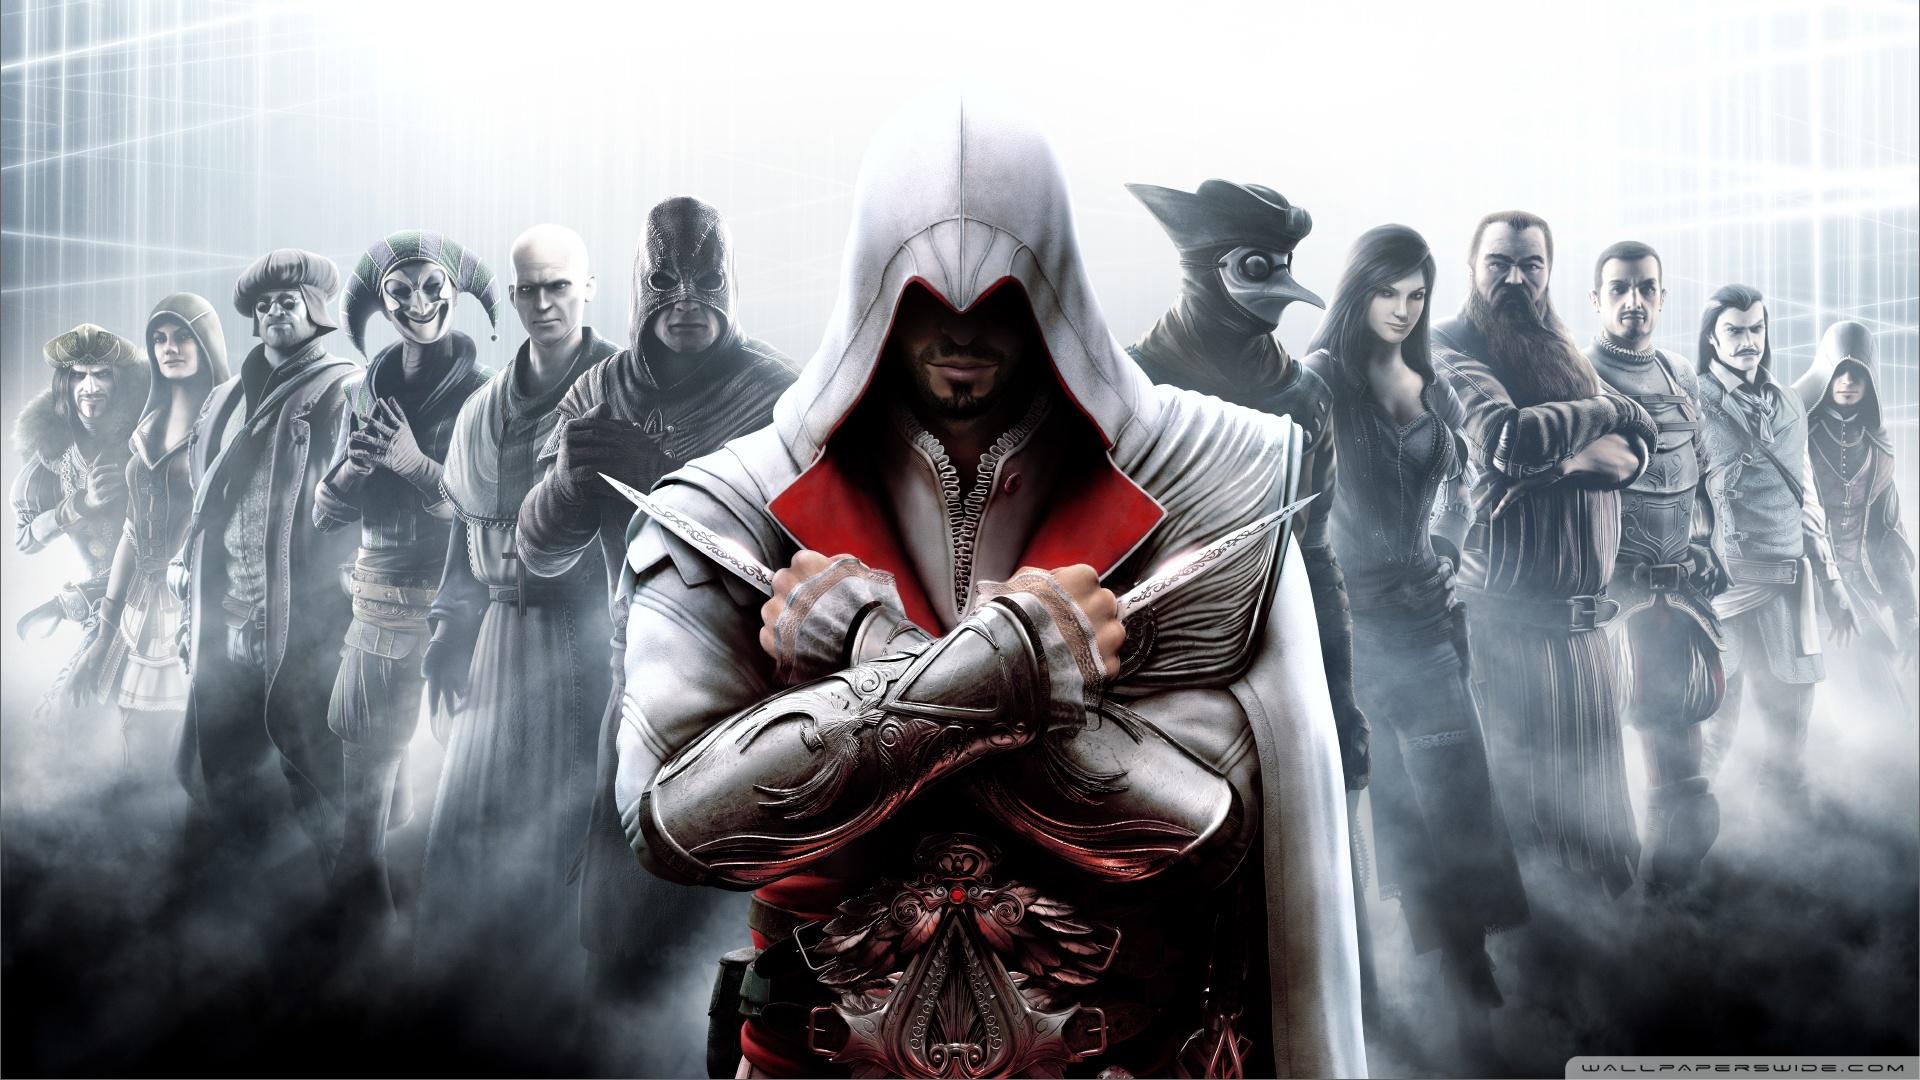 Assassins Creed Brotherhood Wallpaper: Assassins_creed_brotherhood_10-wallpaper-1920×1080